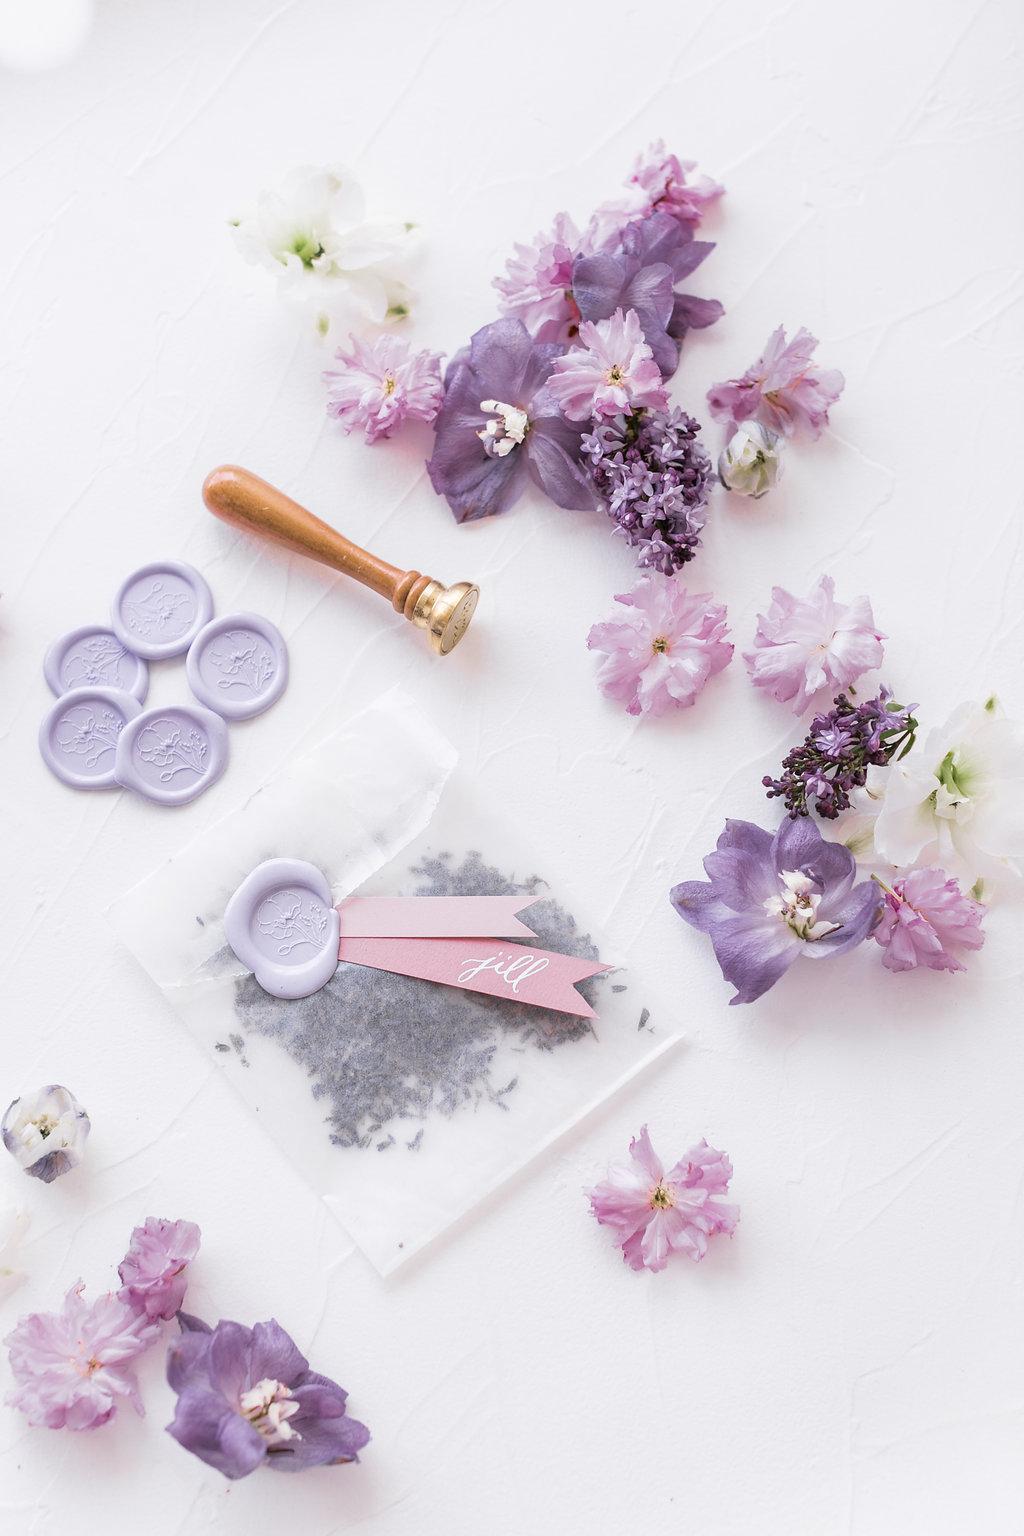 FloralBrickWeddingEditorial-NatalieSchuttPhotography-25 copy.JPG